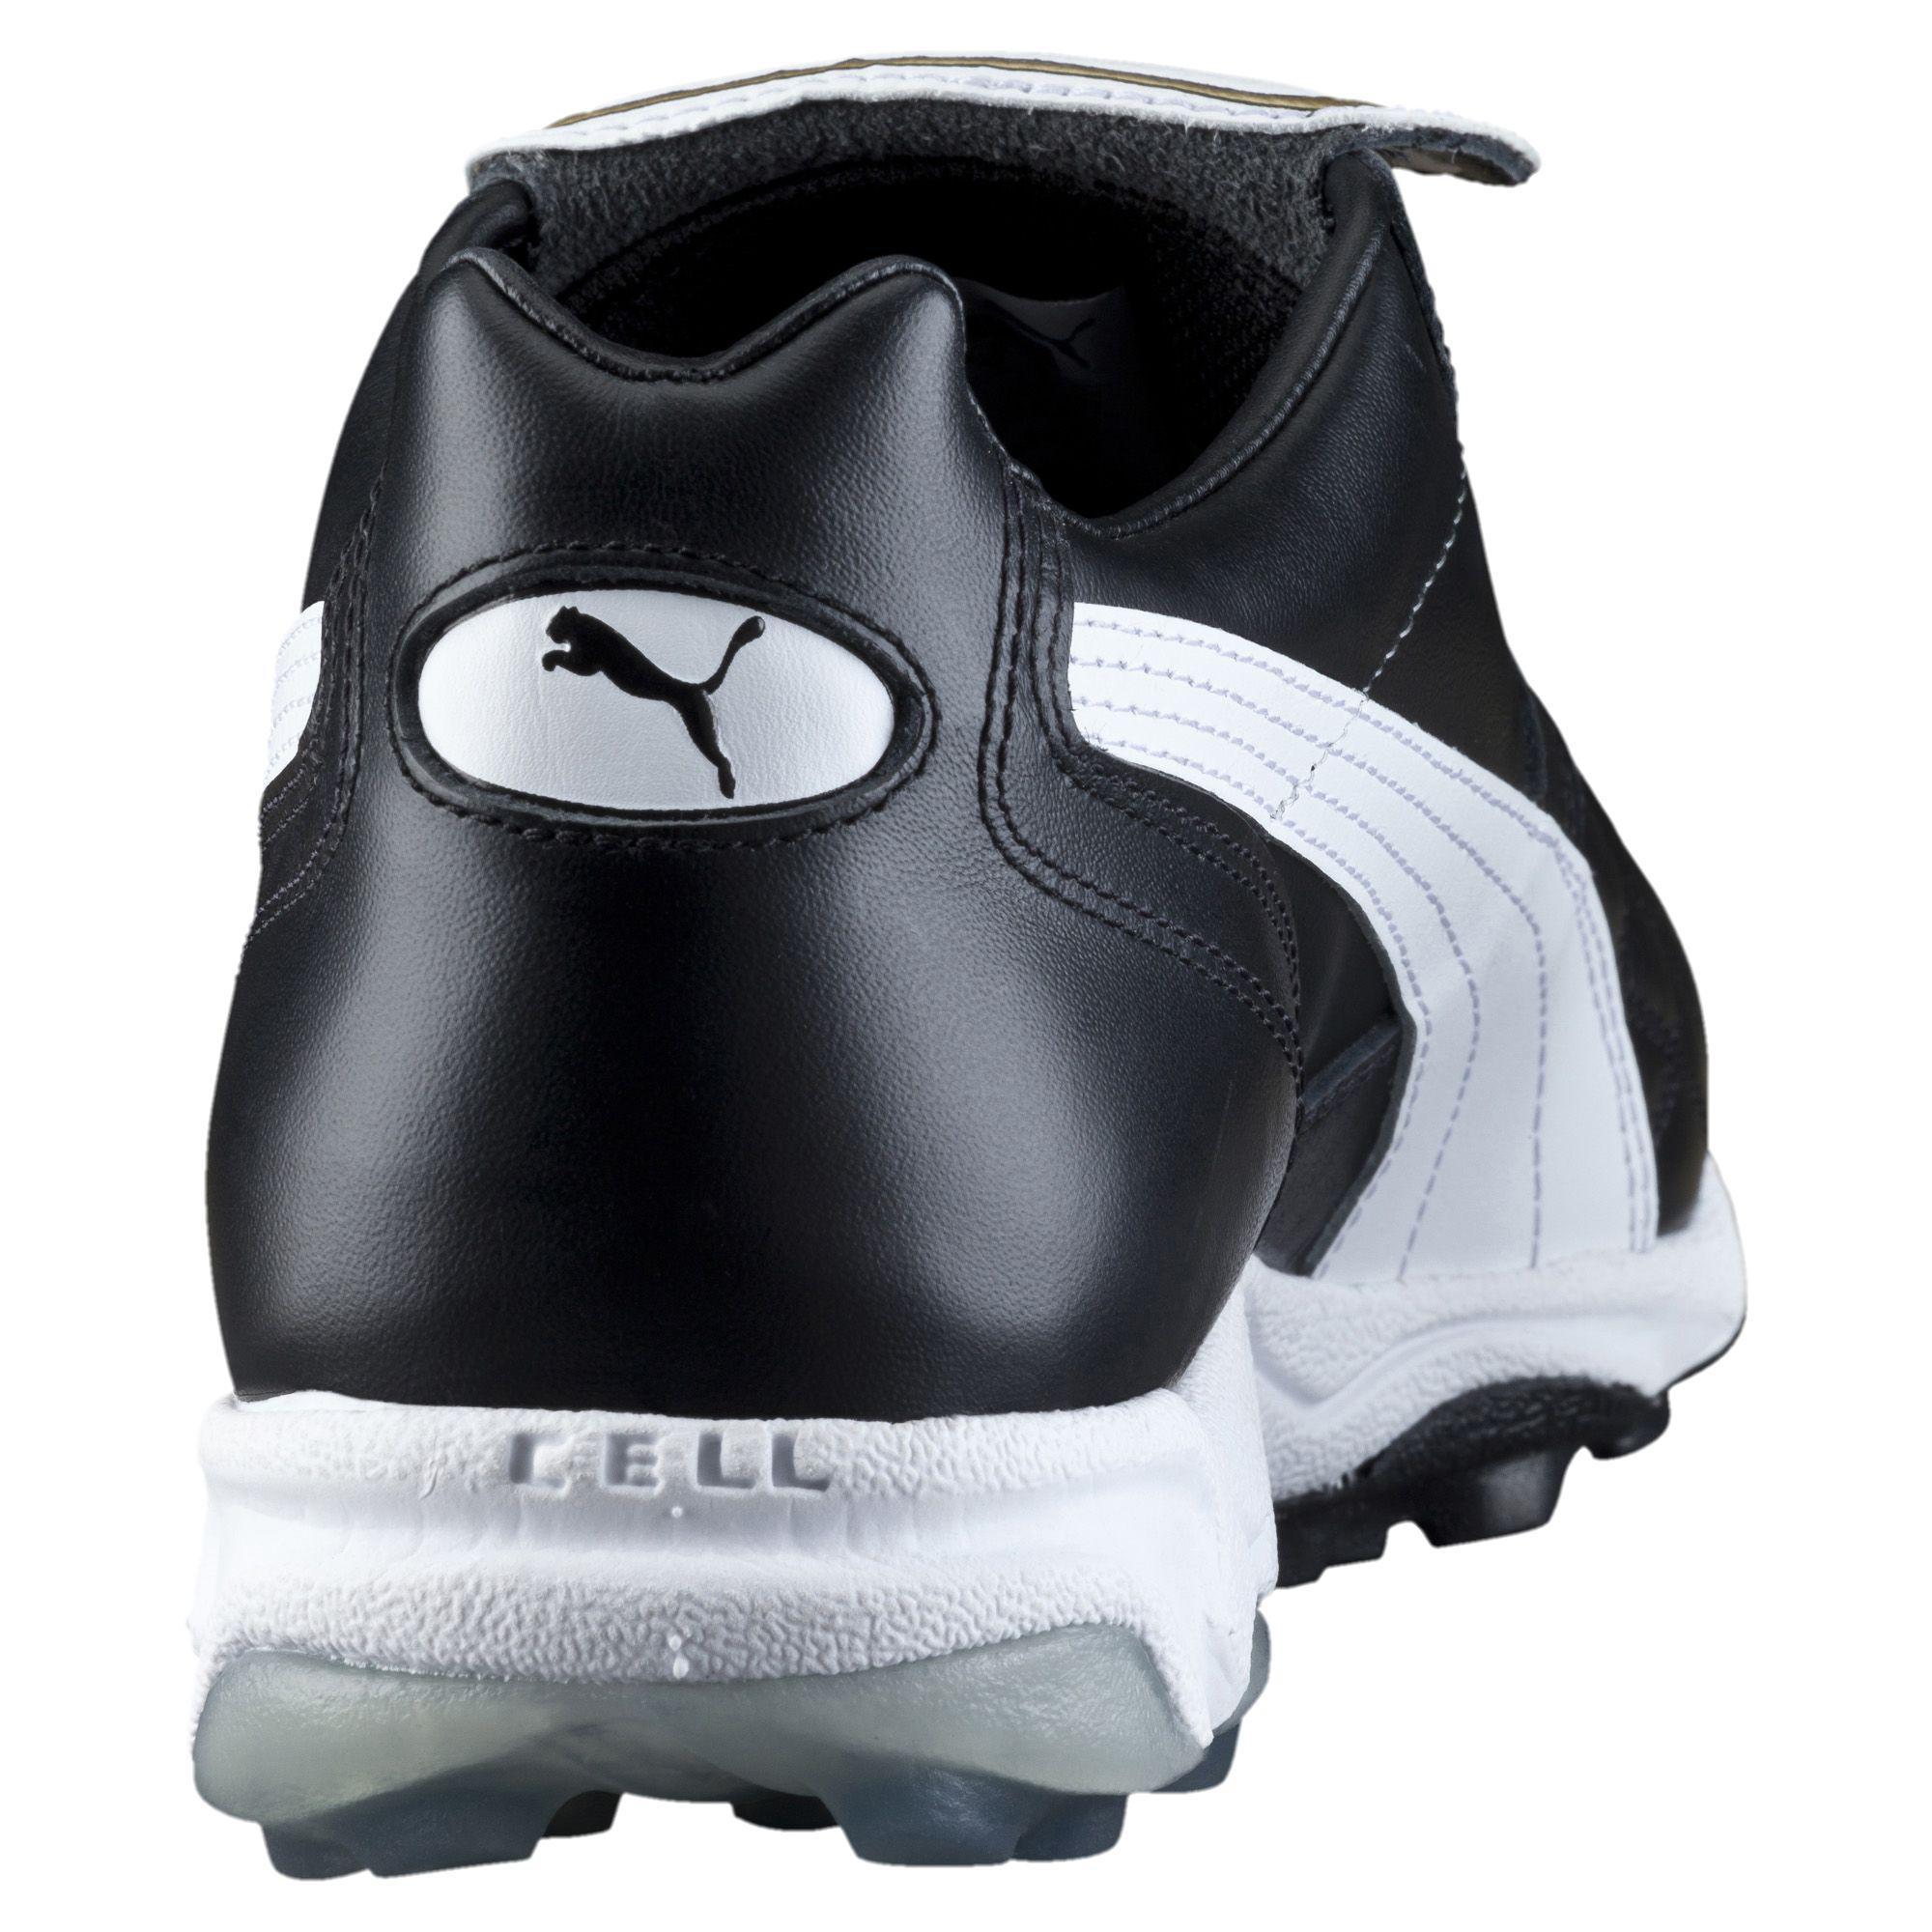 3a0541861 PUMA King Allround Tt Men's Soccer Shoes in Black for Men - Lyst